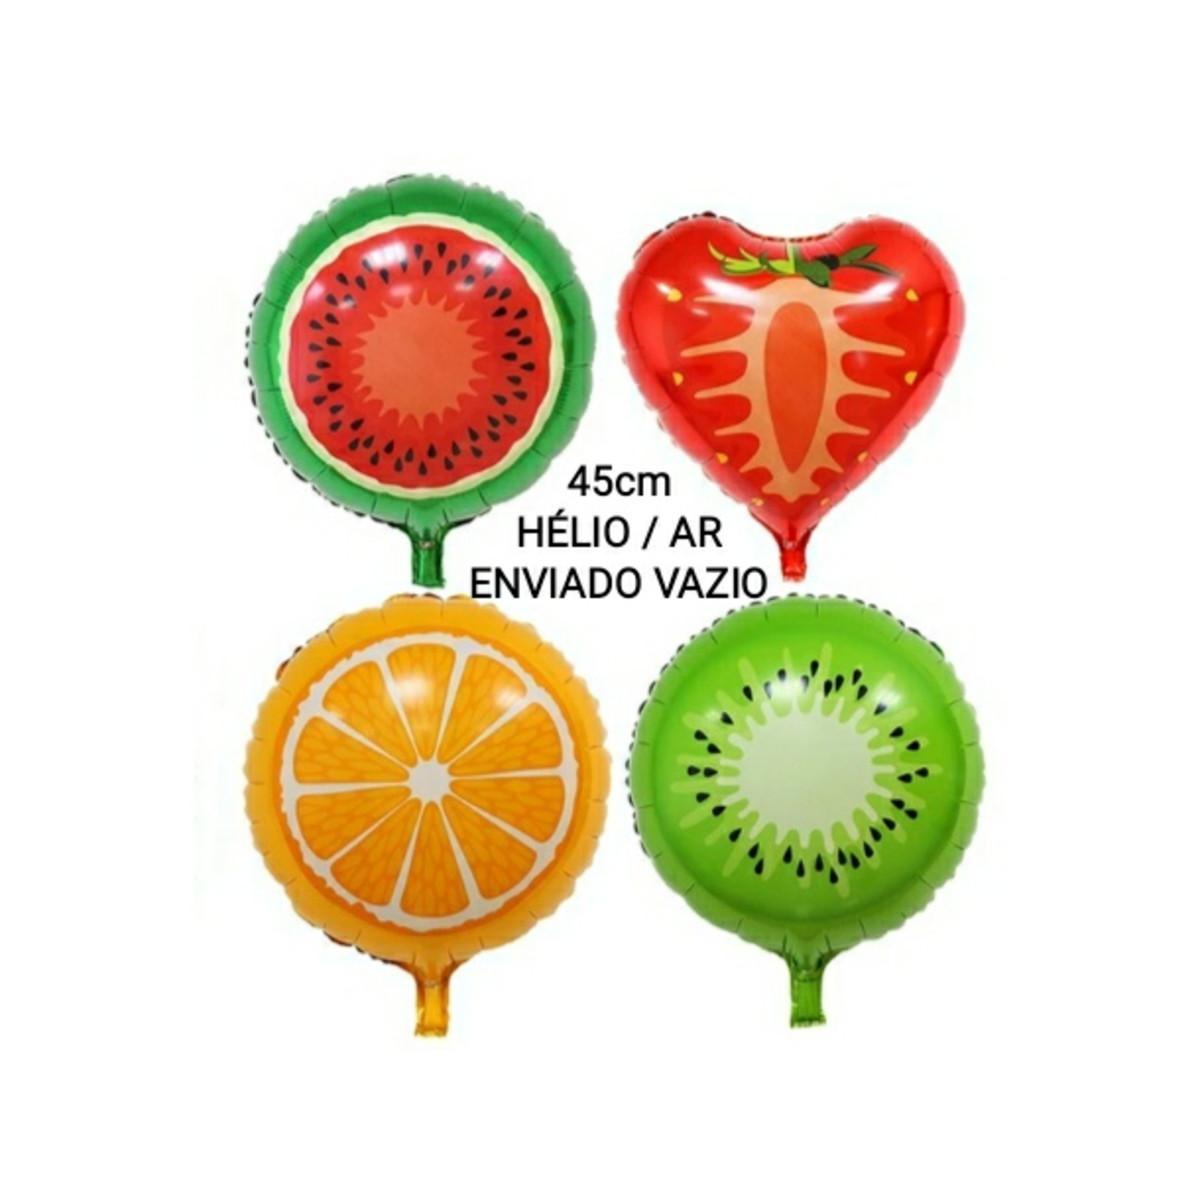 A Fruta Carambola Serve Para Que 4 balÕes de frutas melancia morango laranja kiwi